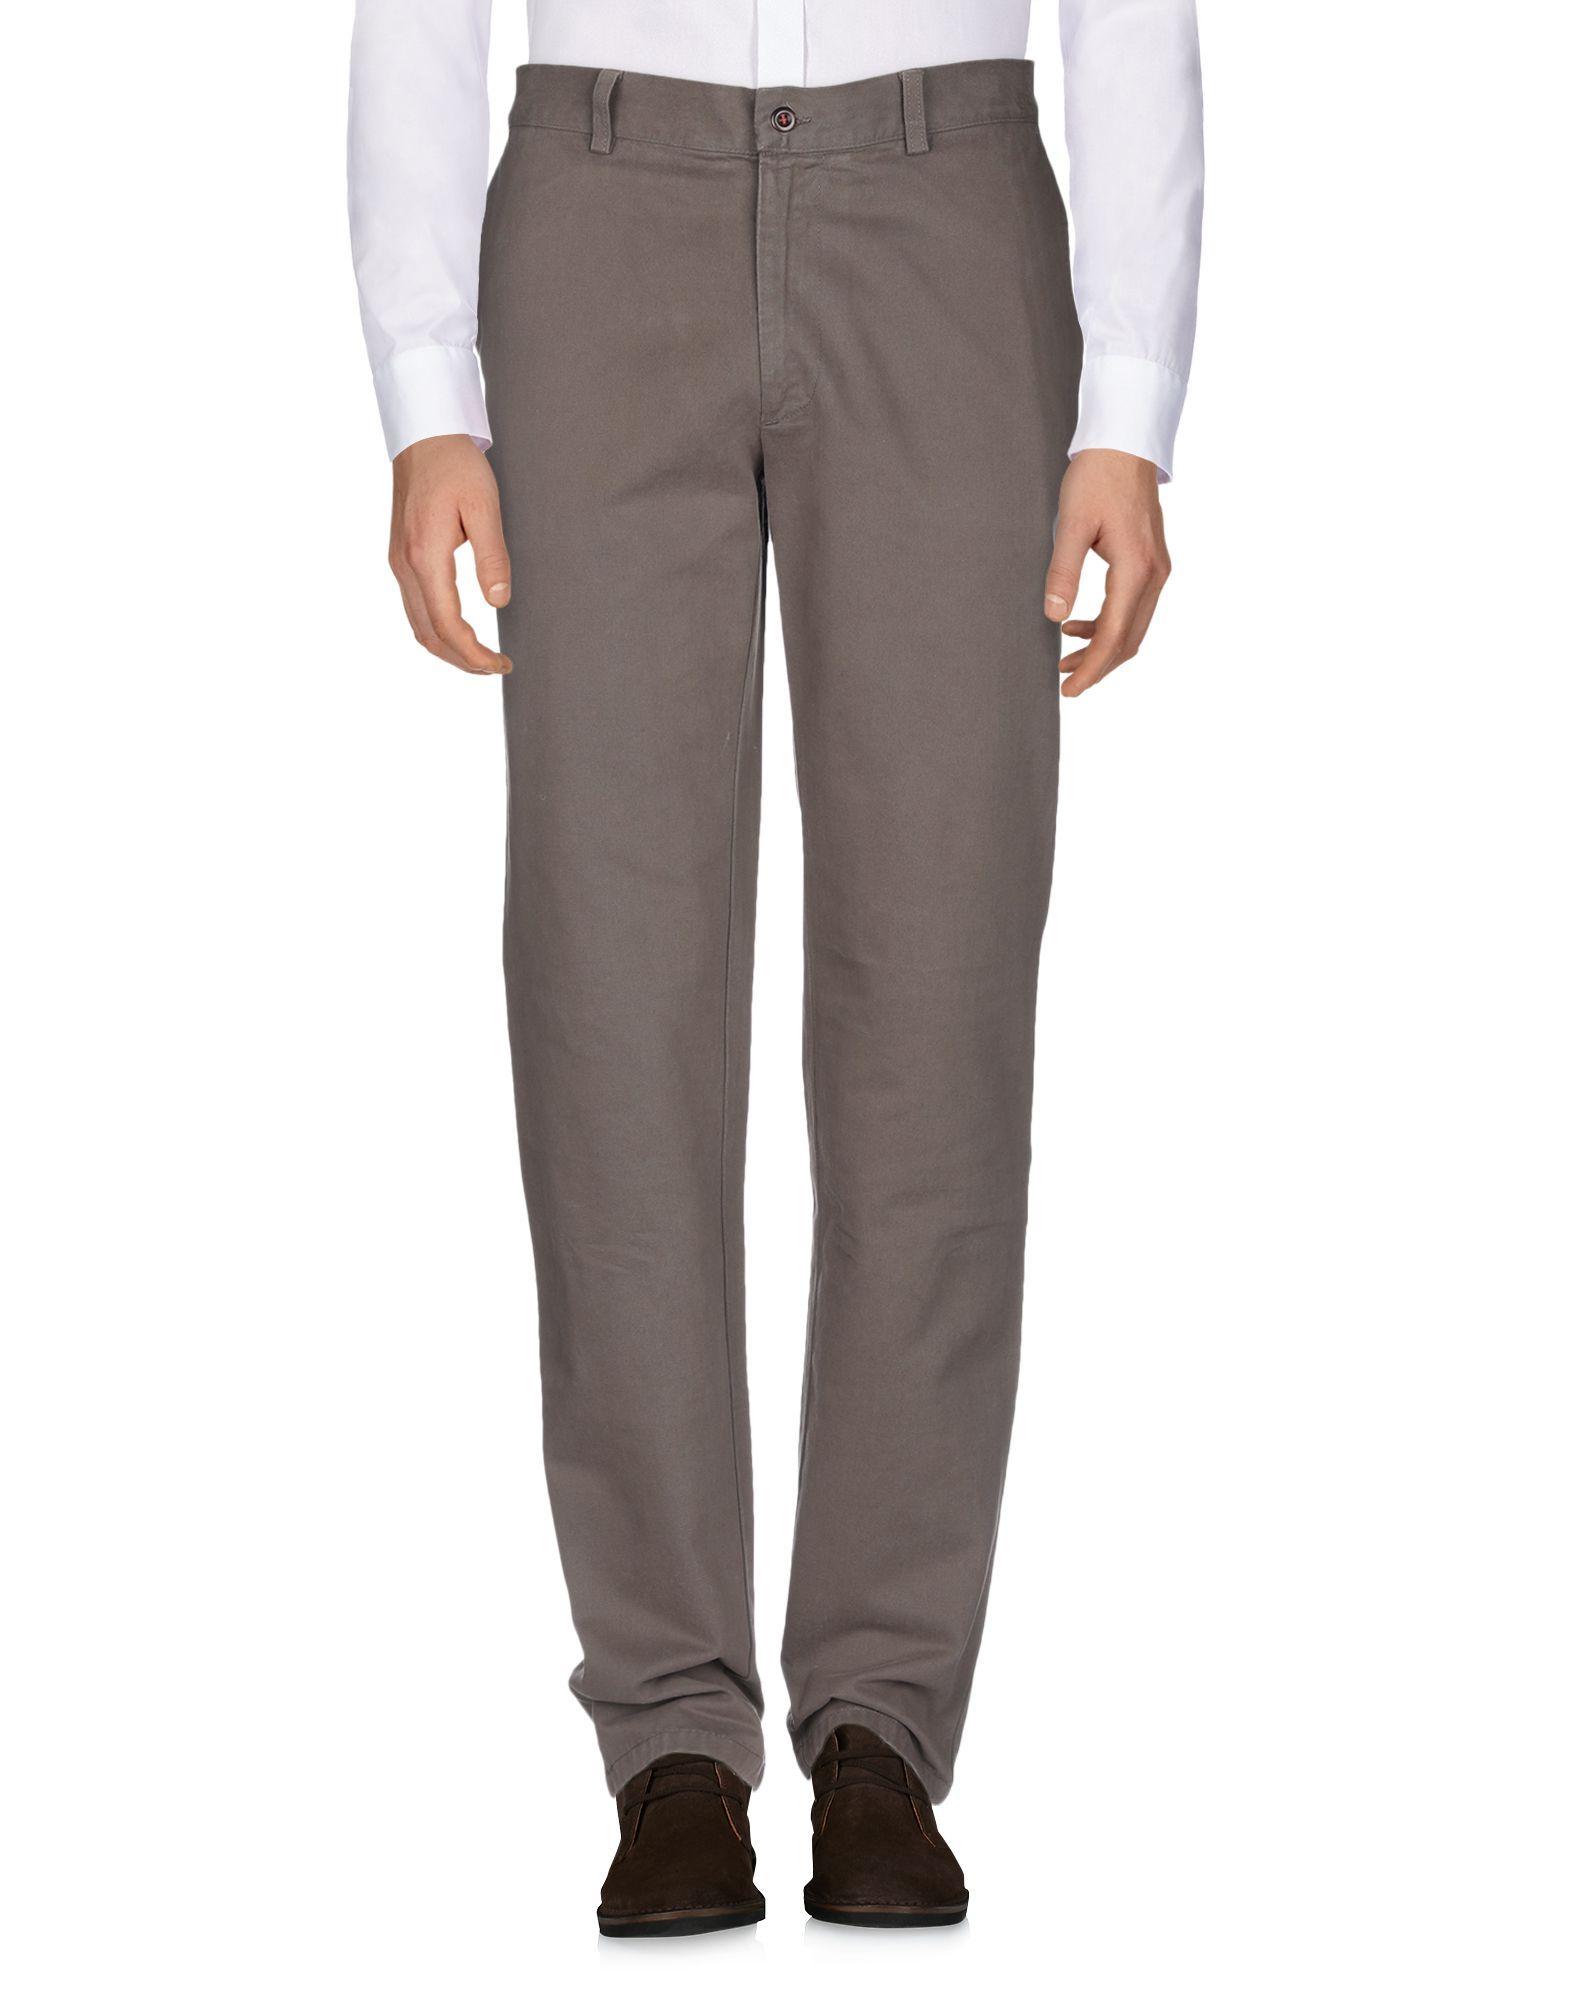 Fay Khaki Cotton Trousers